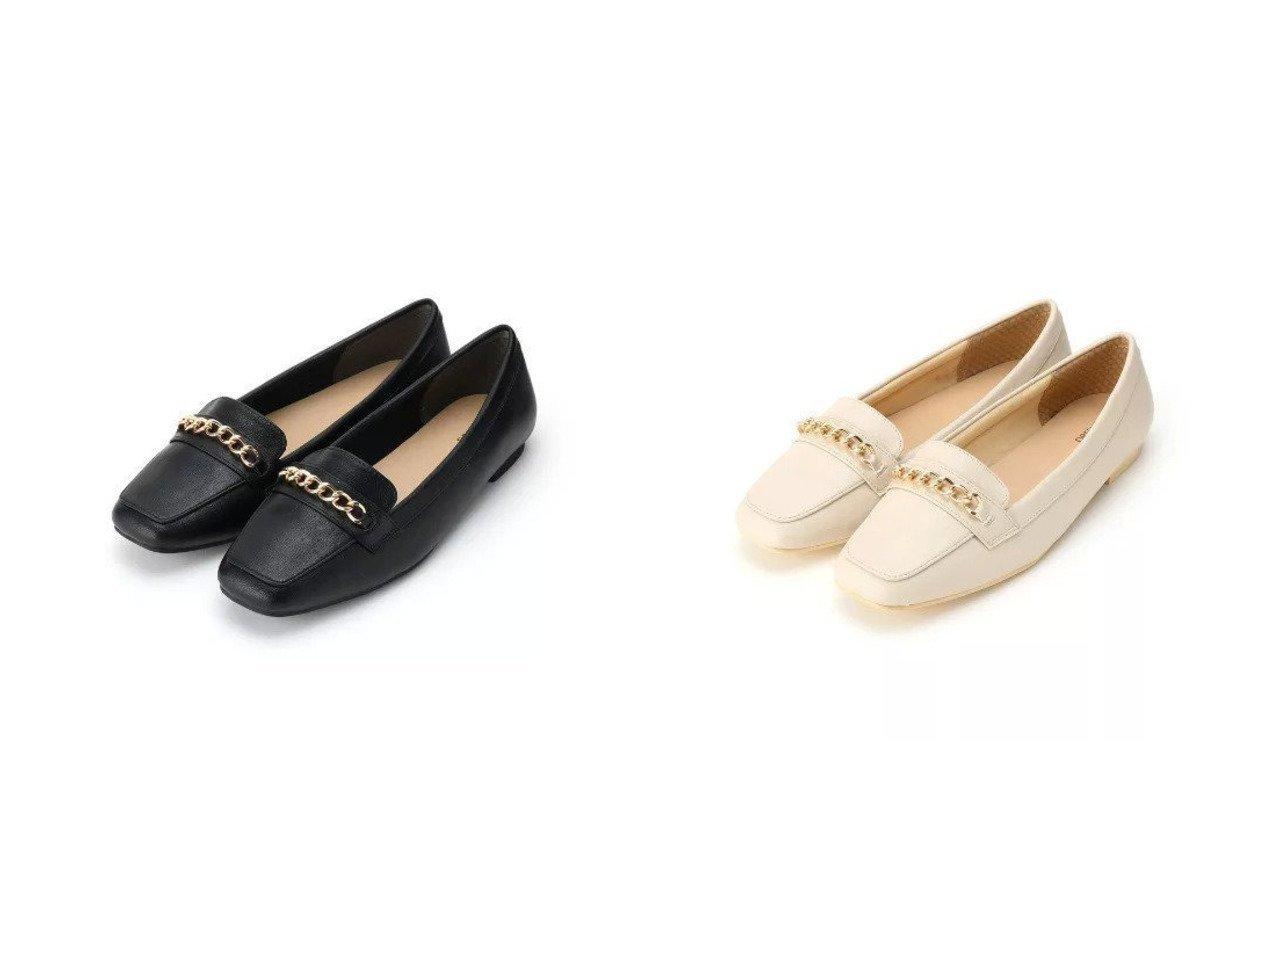 【SHOO LA RUE / DRESKIP/シューラルー ドレスキップ】のチェーンローファー 【シューズ・靴】おすすめ!人気、トレンド・レディースファッションの通販  | レディースファッション・服の通販 founy(ファニー)